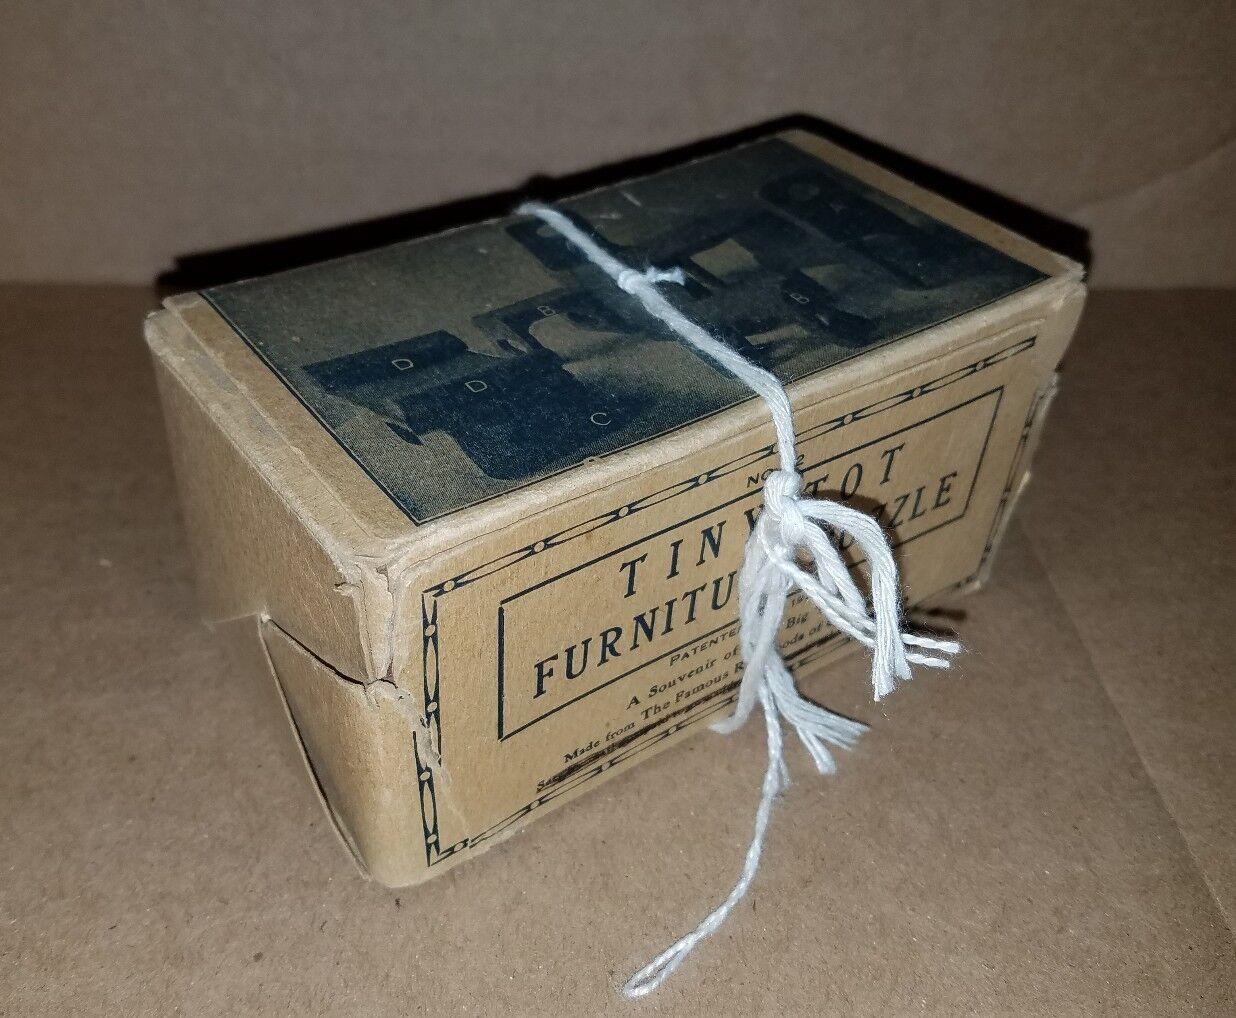 Vtg Tiny Tot Furniture Puzzle No.12 Manufacturer NV Winter Patent 1927